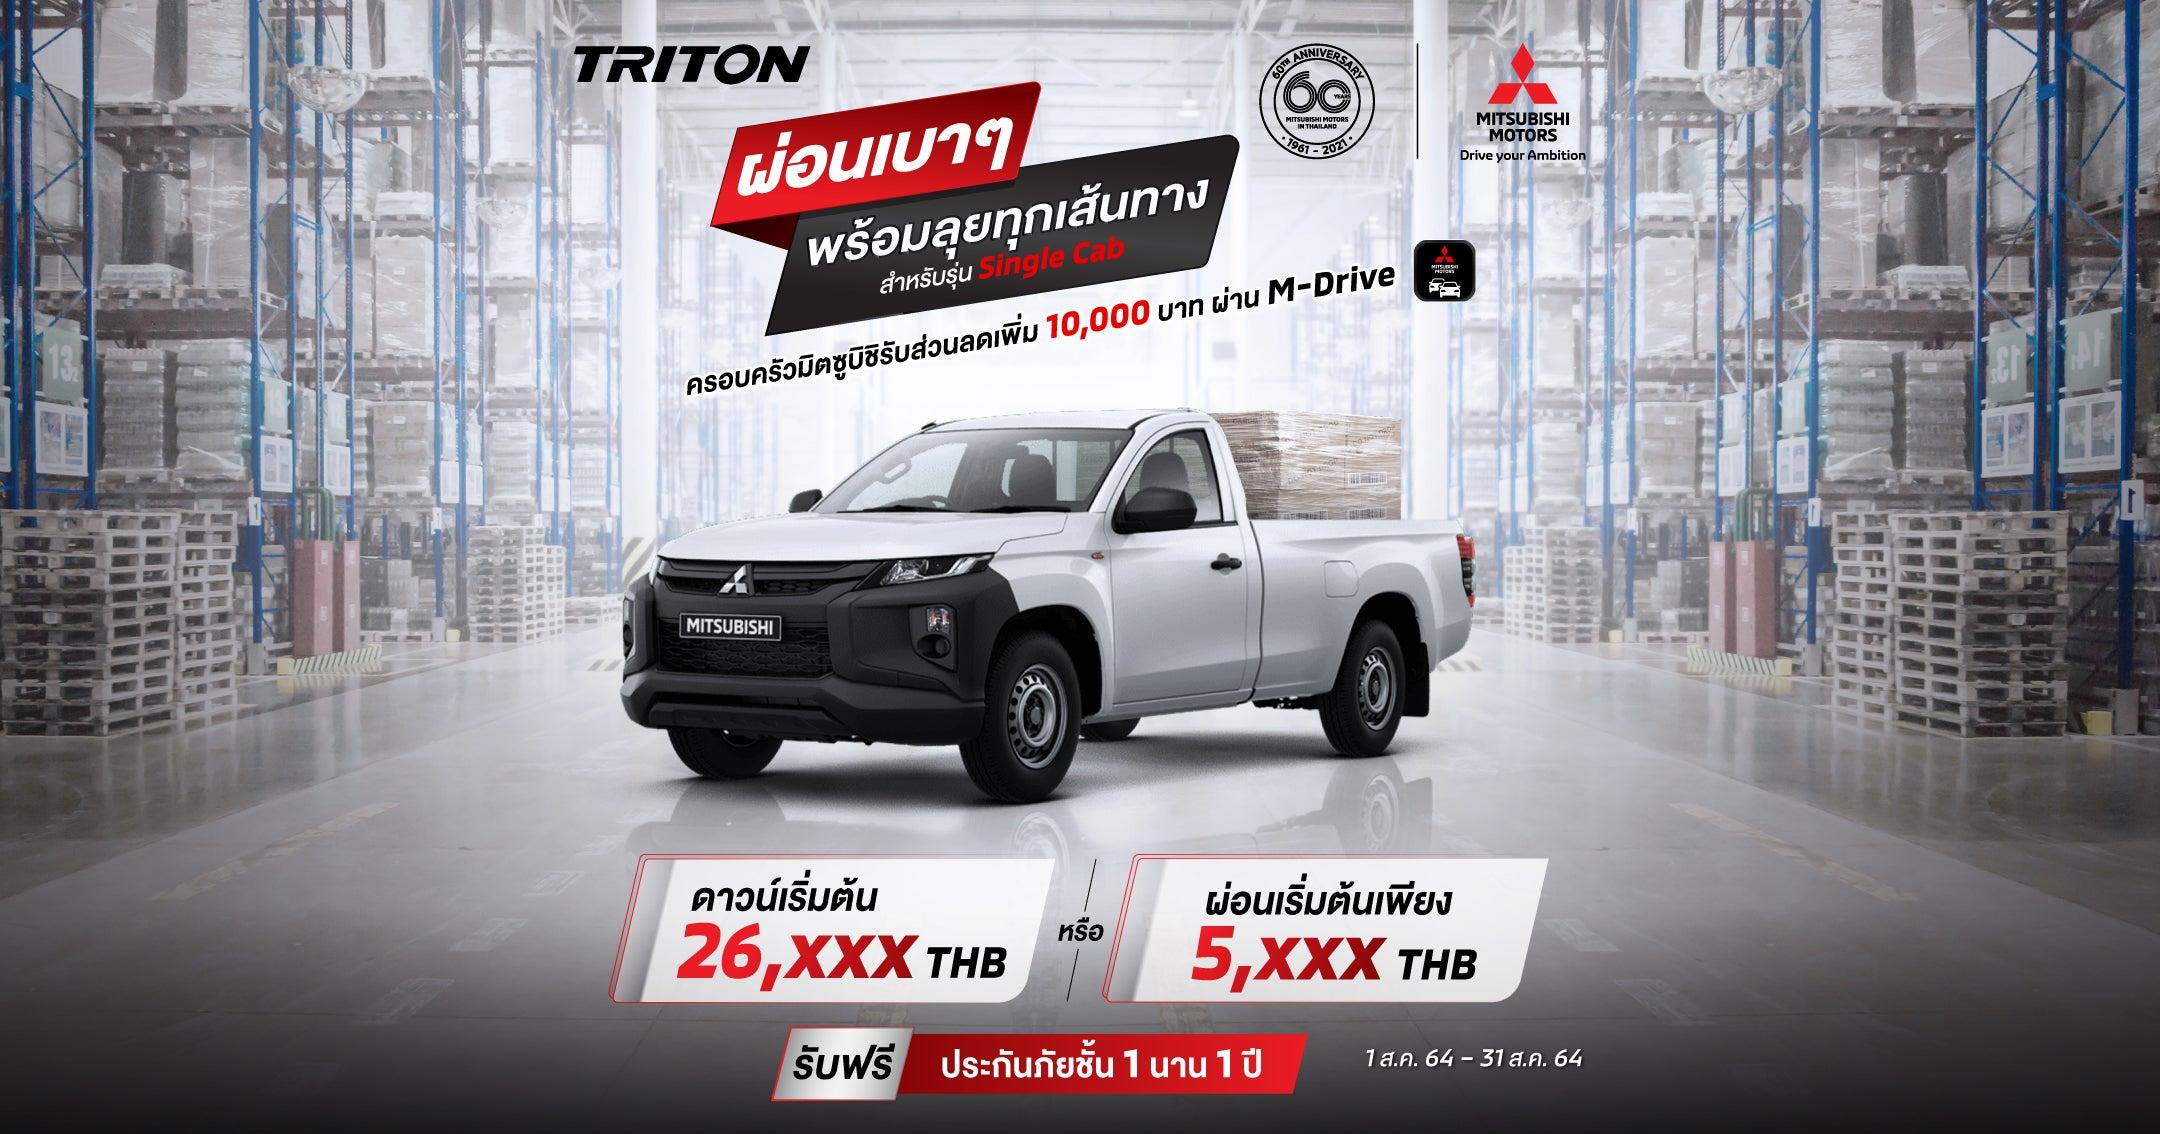 New Triton สำหรับรุ่น ซิงเกิ้ล แค็บ (LR) ดาวน์เริ่มต้นเพียง 26,XXX บาท